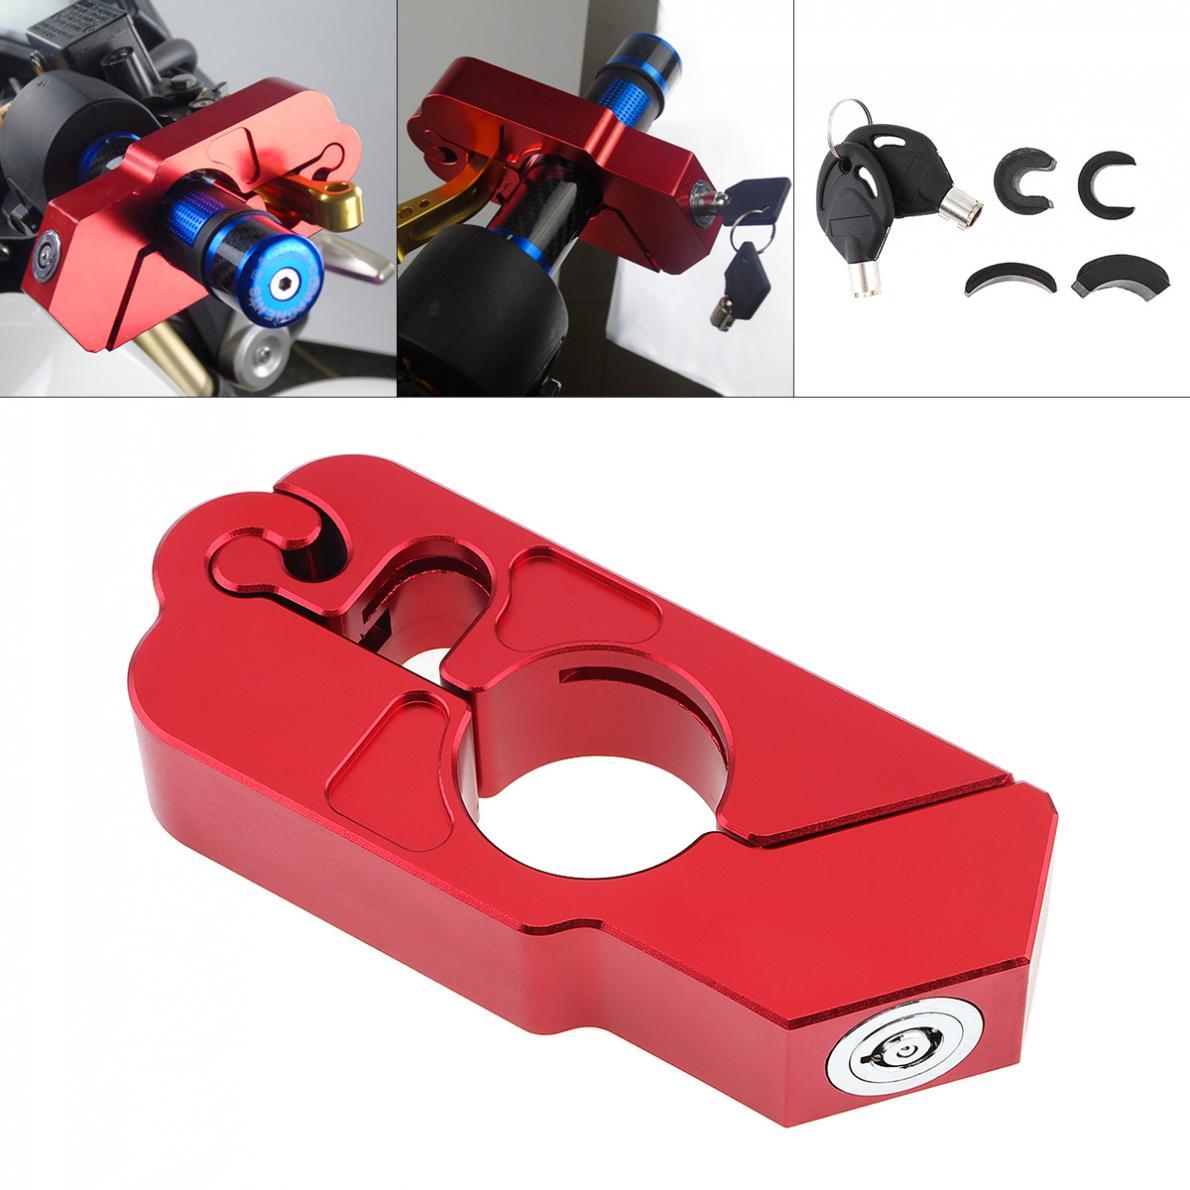 CNC Handlebar Grip Locks Universal Motorcycle Security Safety Locks Brake Clutch Levers Locks Theft Protection Lock